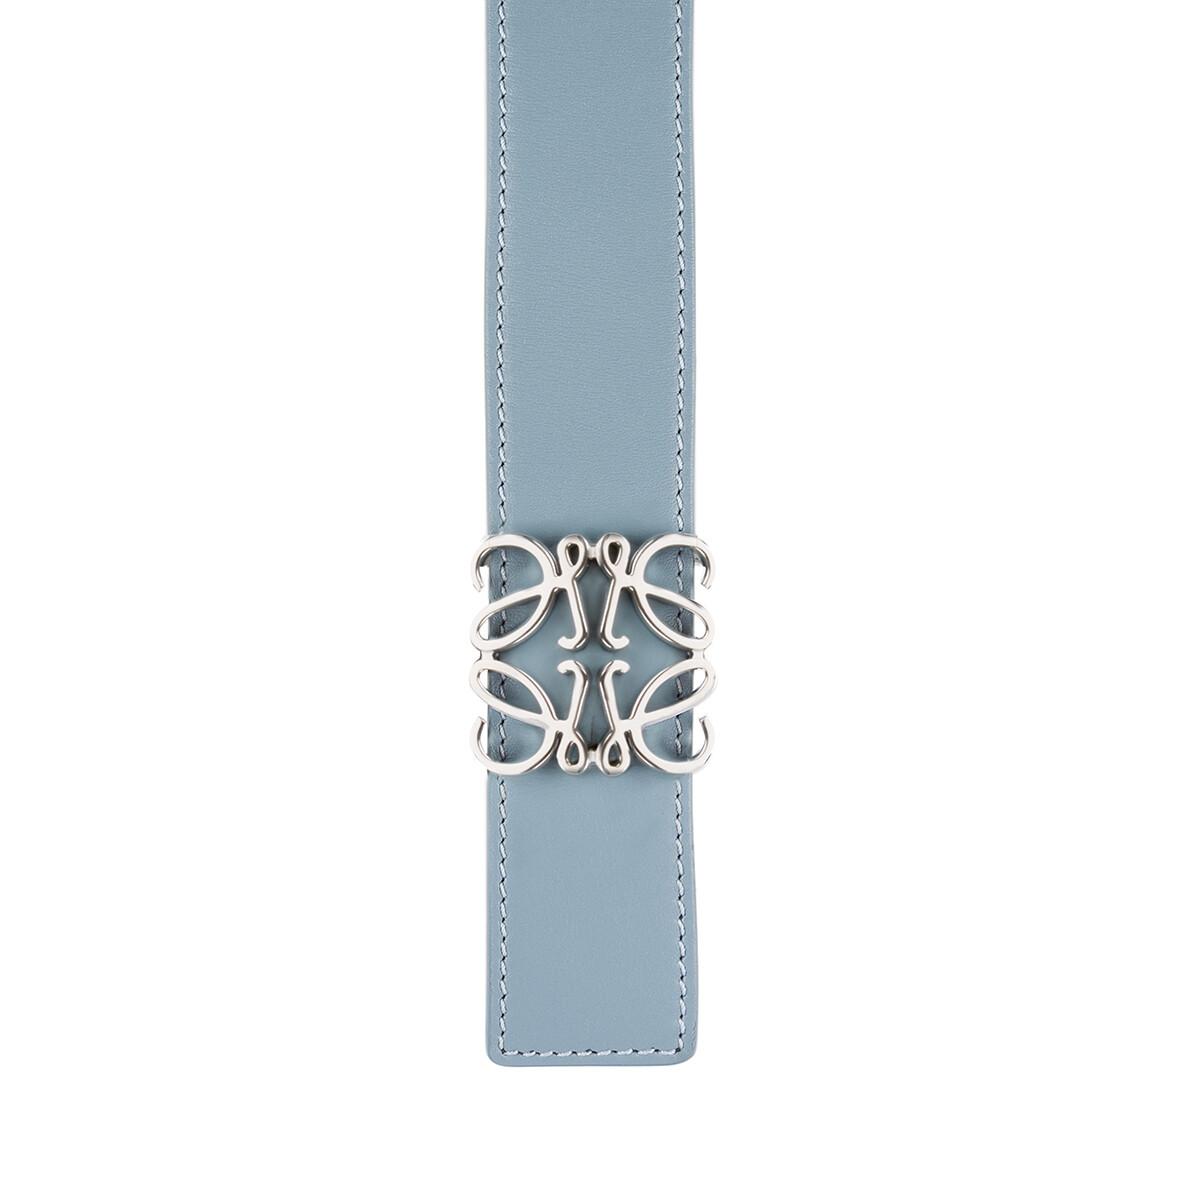 LOEWE Cinturon Anagrama 3.2Cm Azul Piedra front